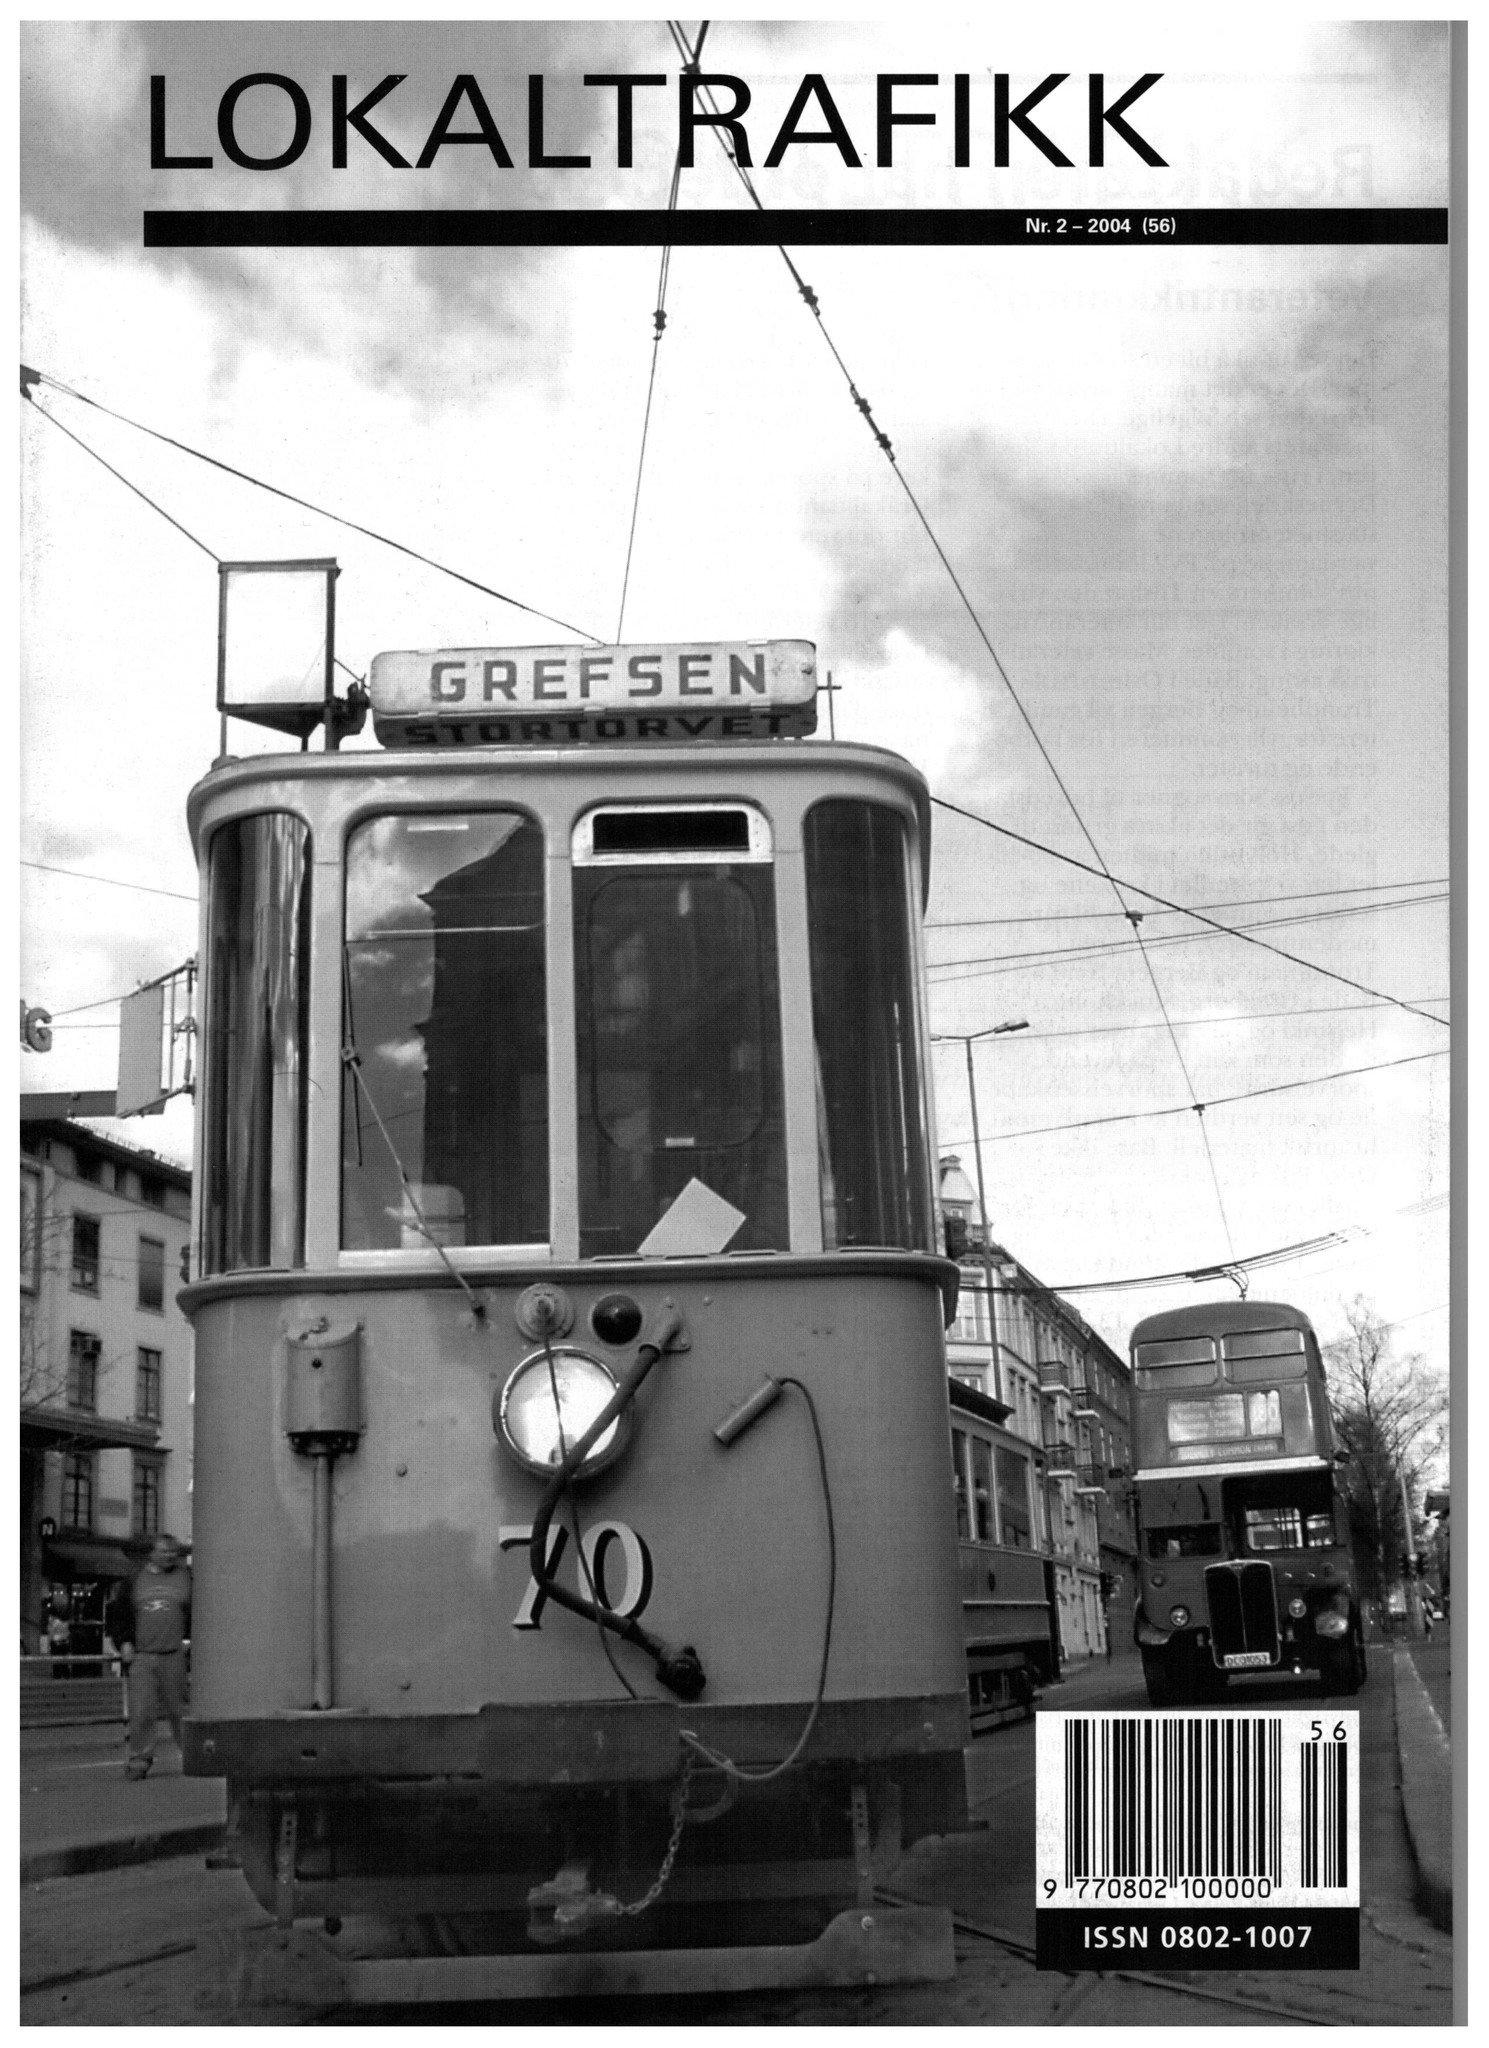 Lokaltrafikk #056